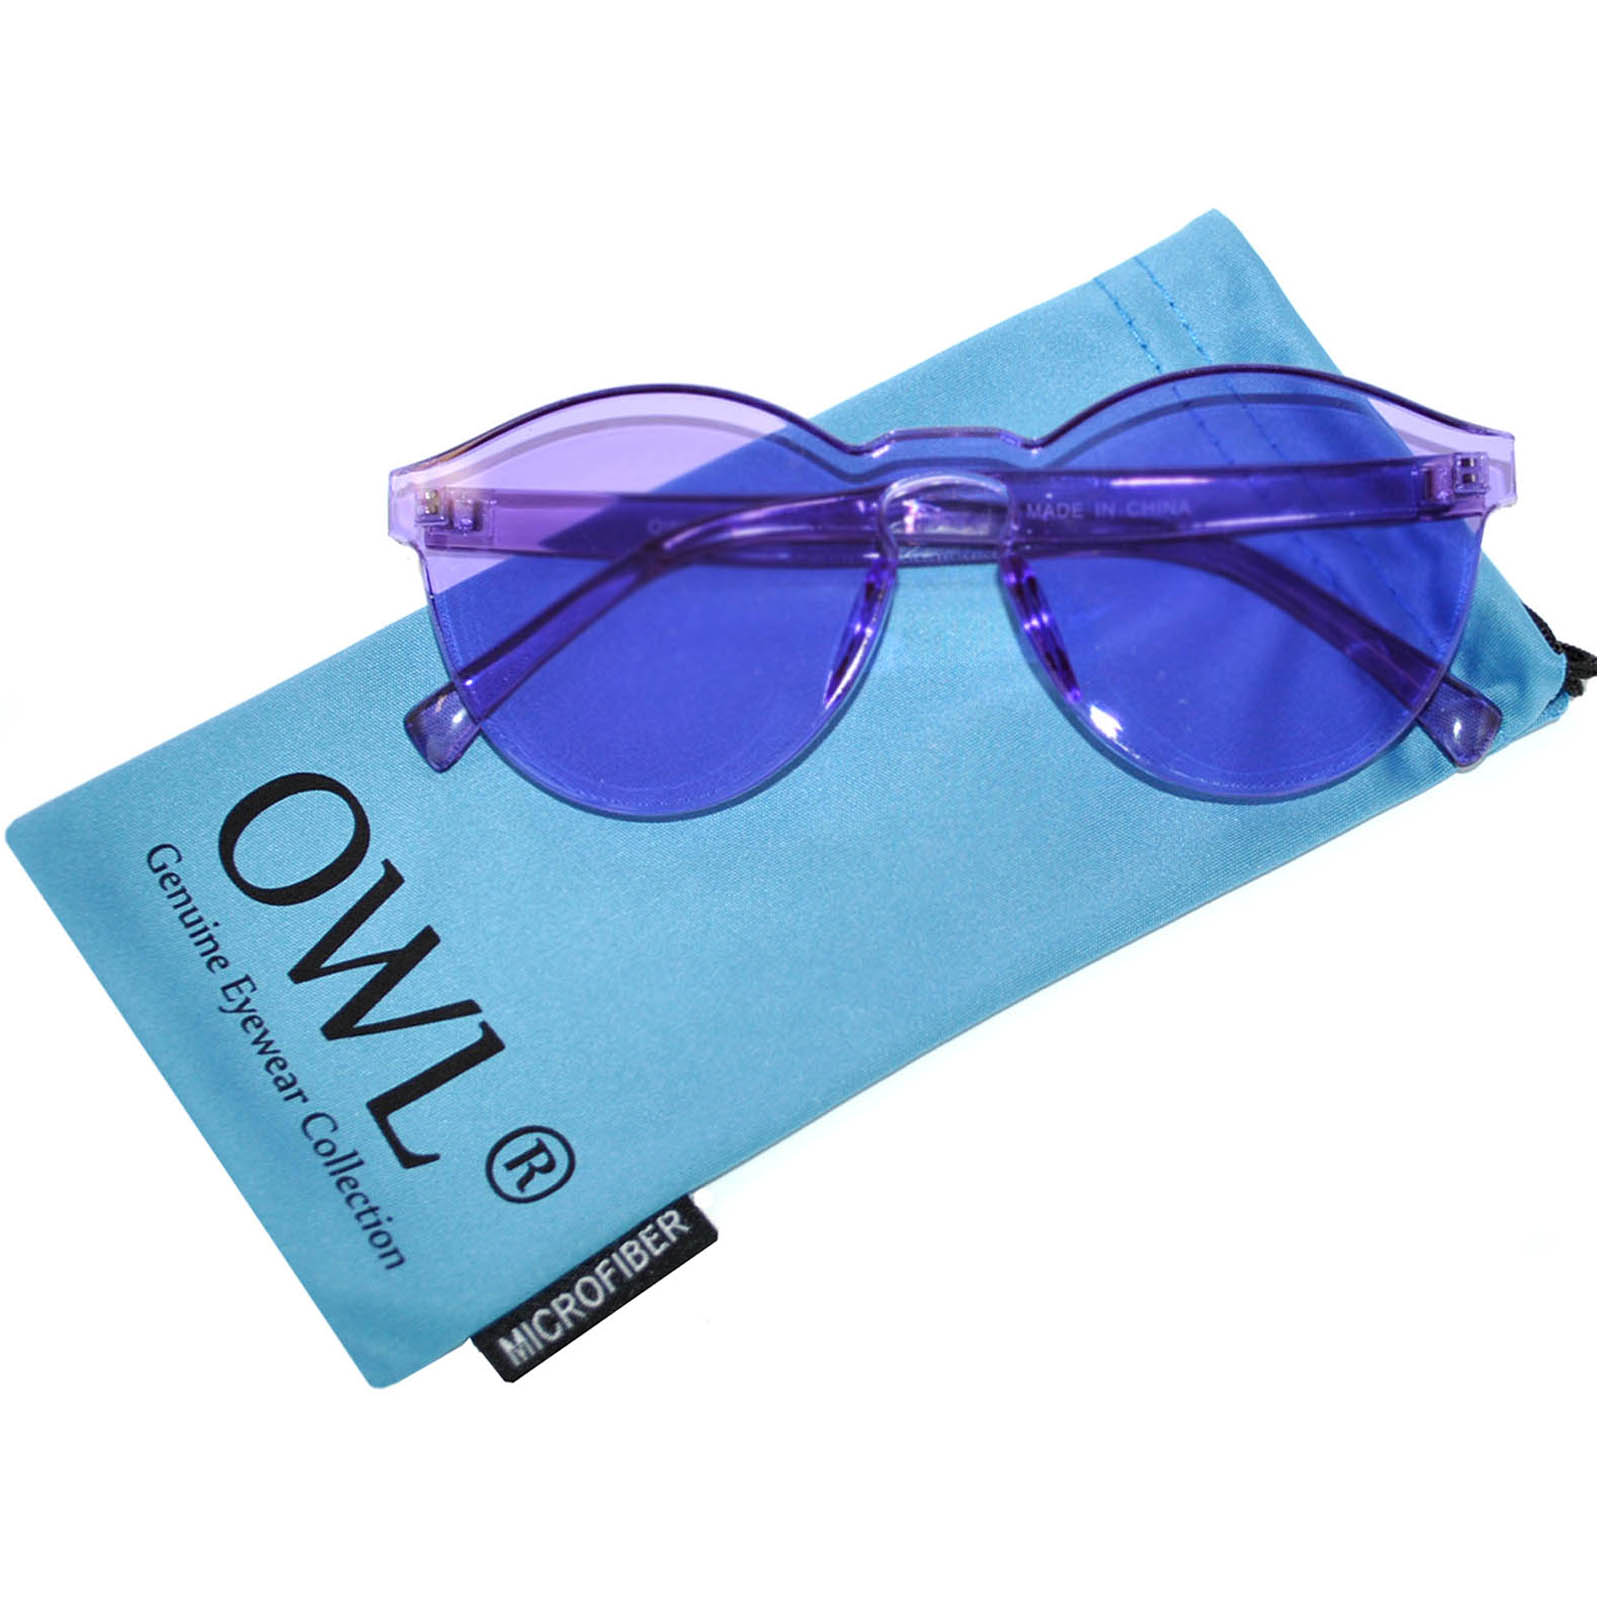 ea935f9b2b22 OWL ® Colorful Transparent Round Retro Women s Fashion Designer ...